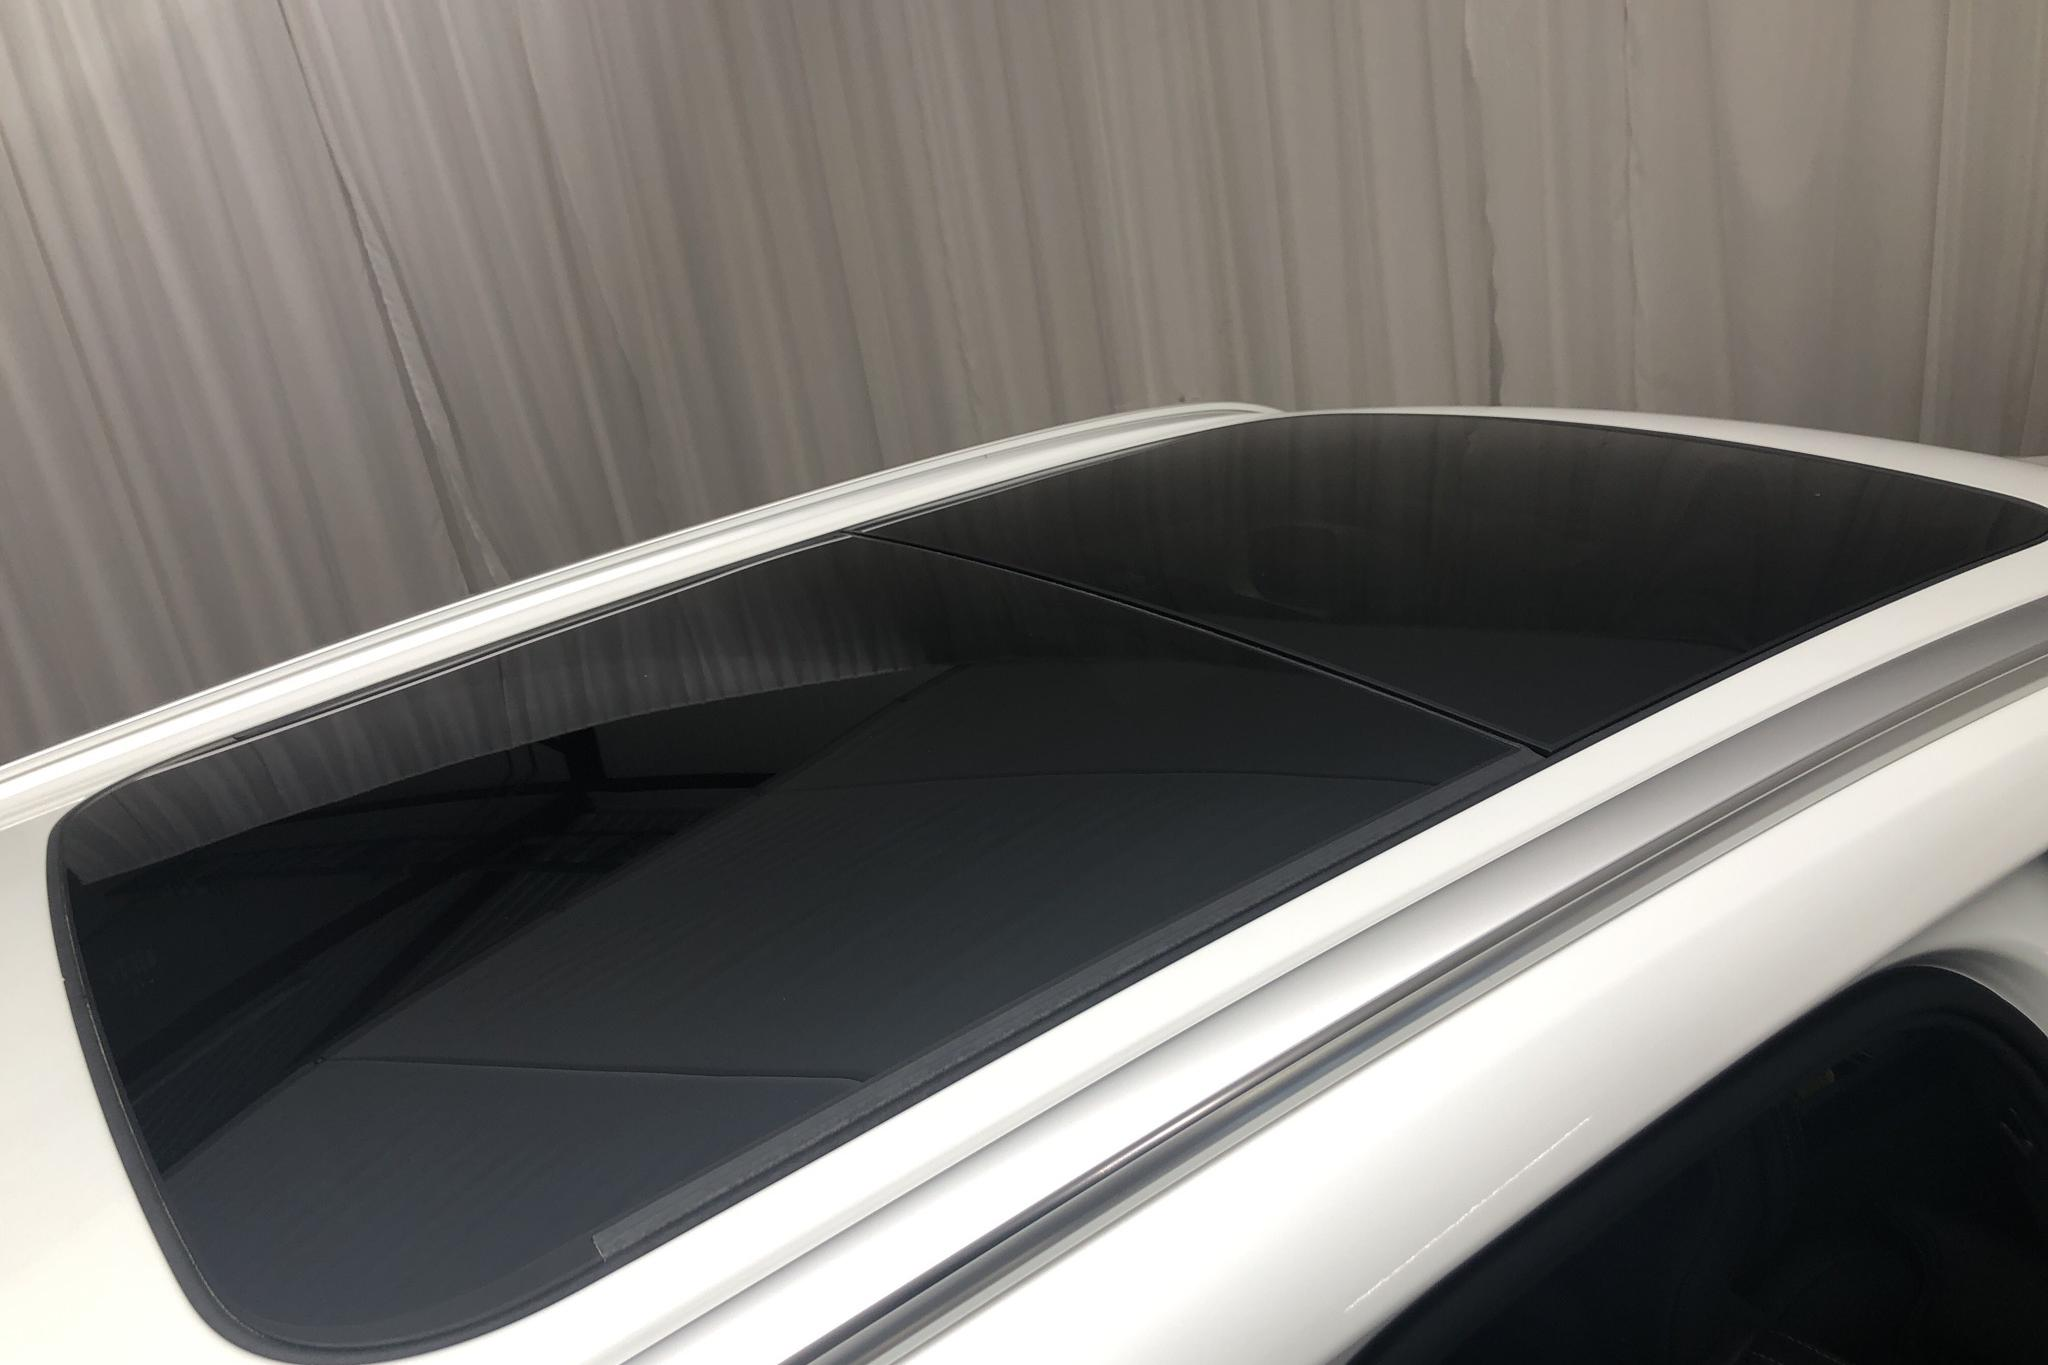 Volvo XC60 T8 AWD Twin Engine (390hk) - 39 050 km - Automatic - white - 2019